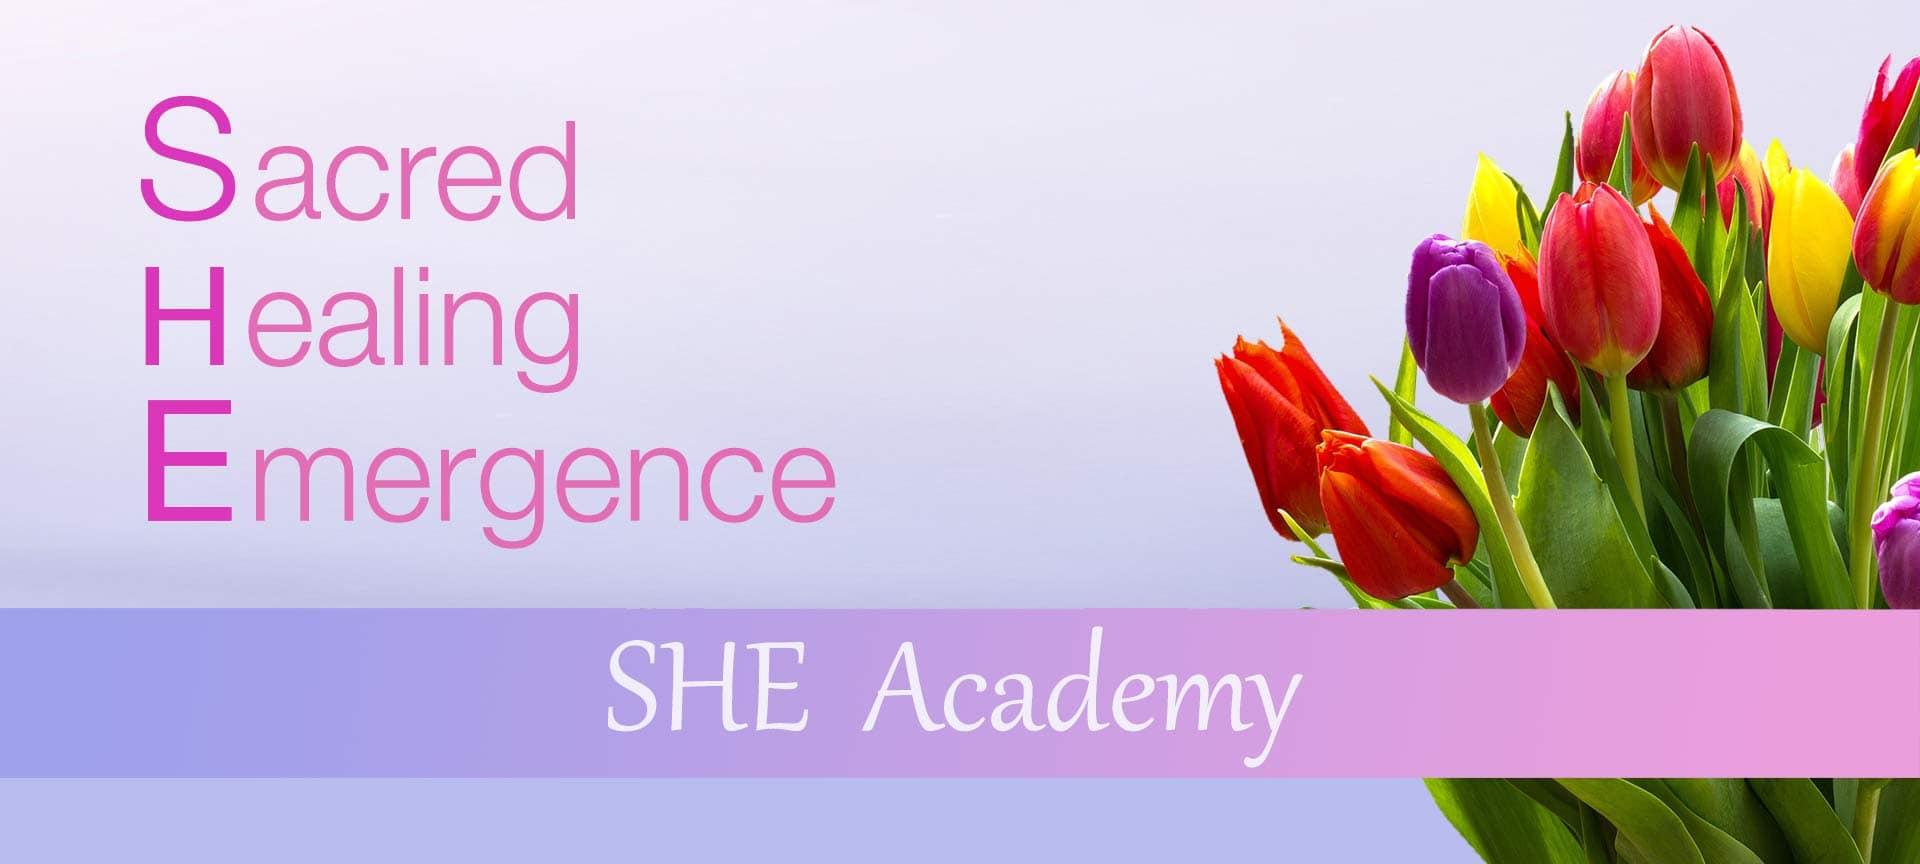 SHE-Academy-splash-v4a@1920w